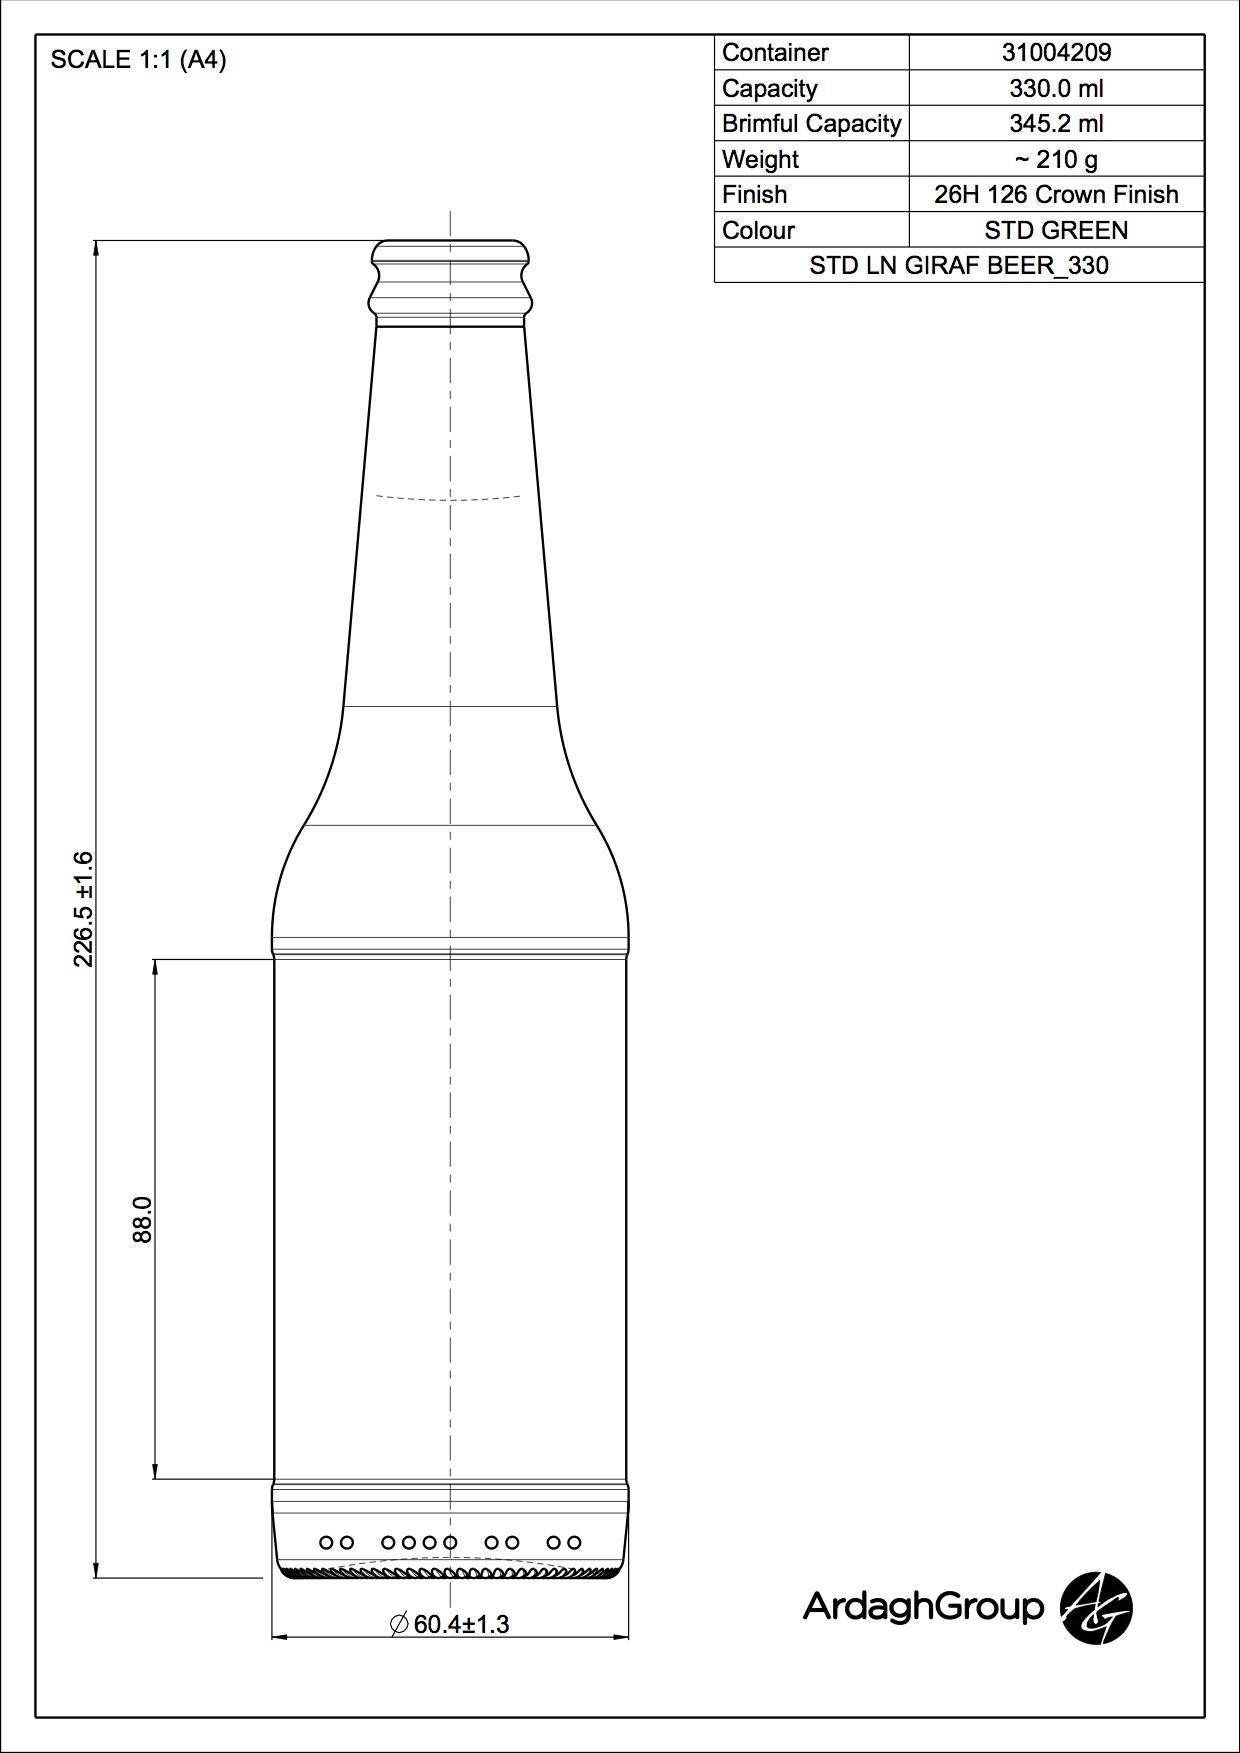 330ml green glass Longneck Giraf oneway beer bottle